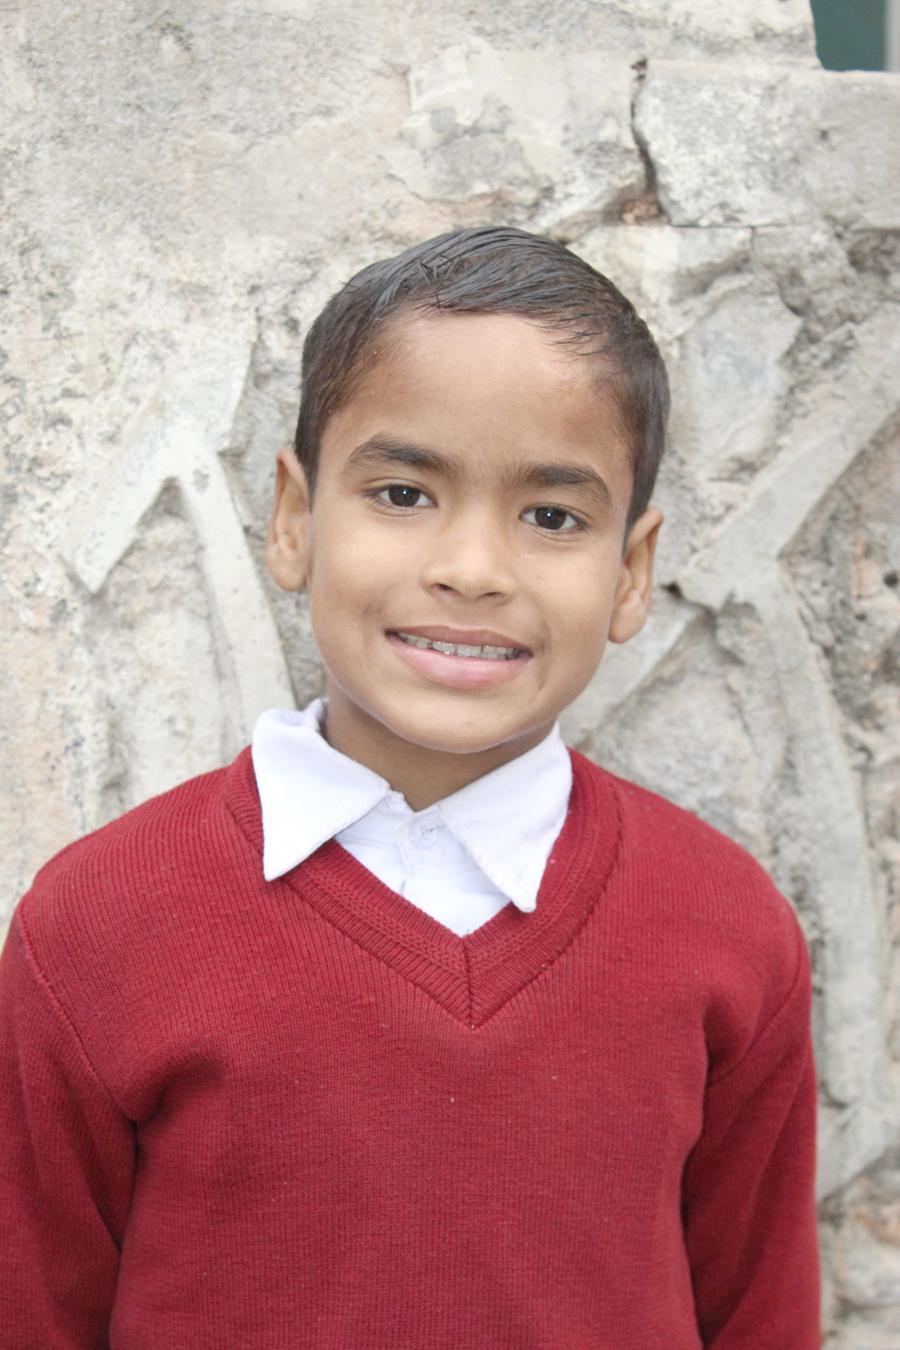 Child Image